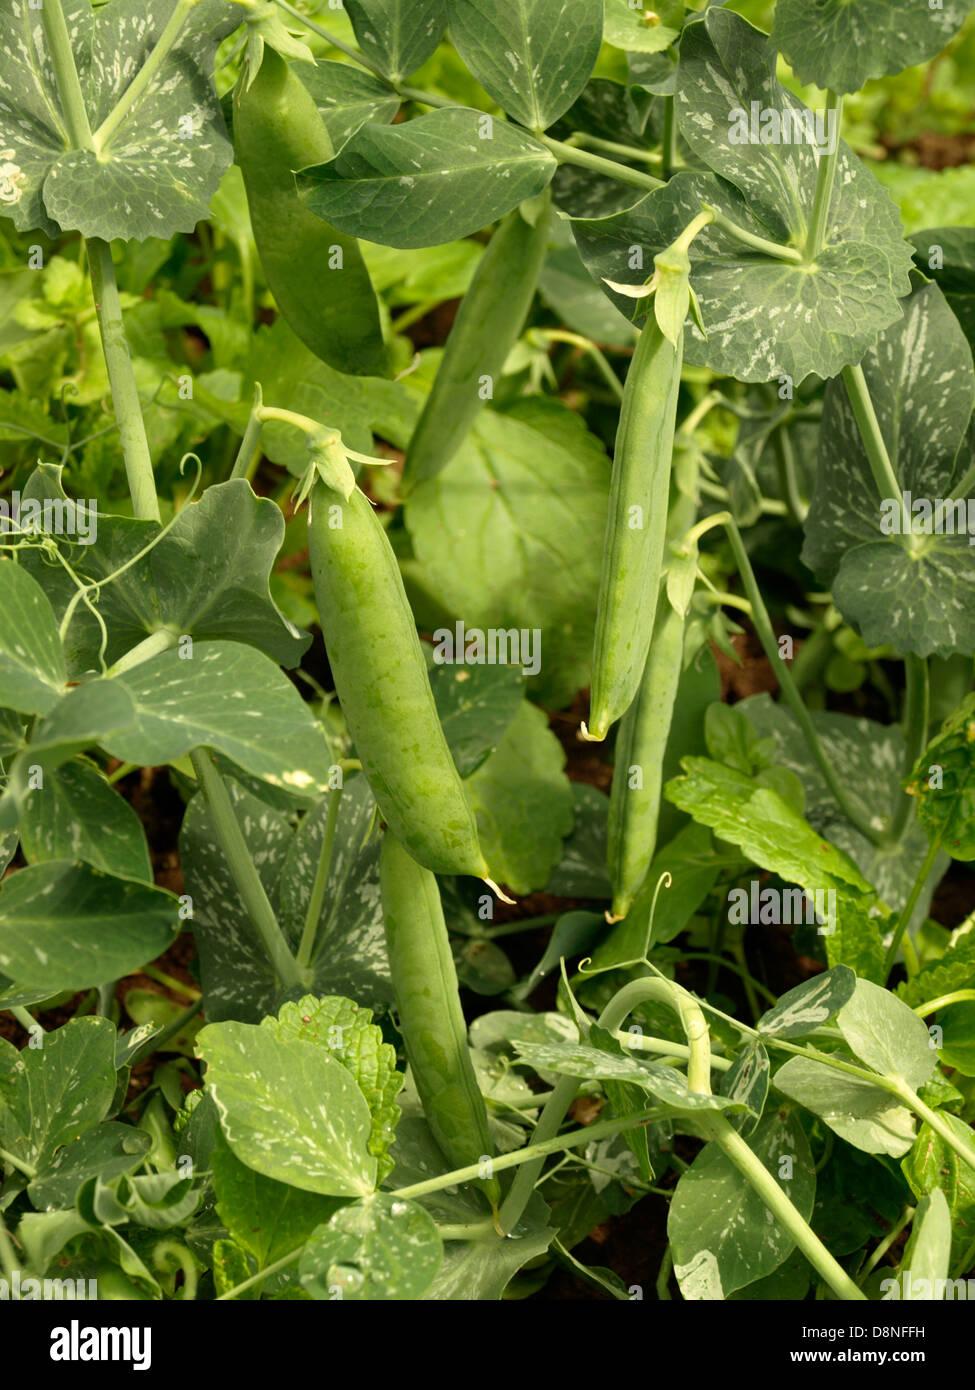 garden pea, Pisum sativum, green pea plant - Stock Image